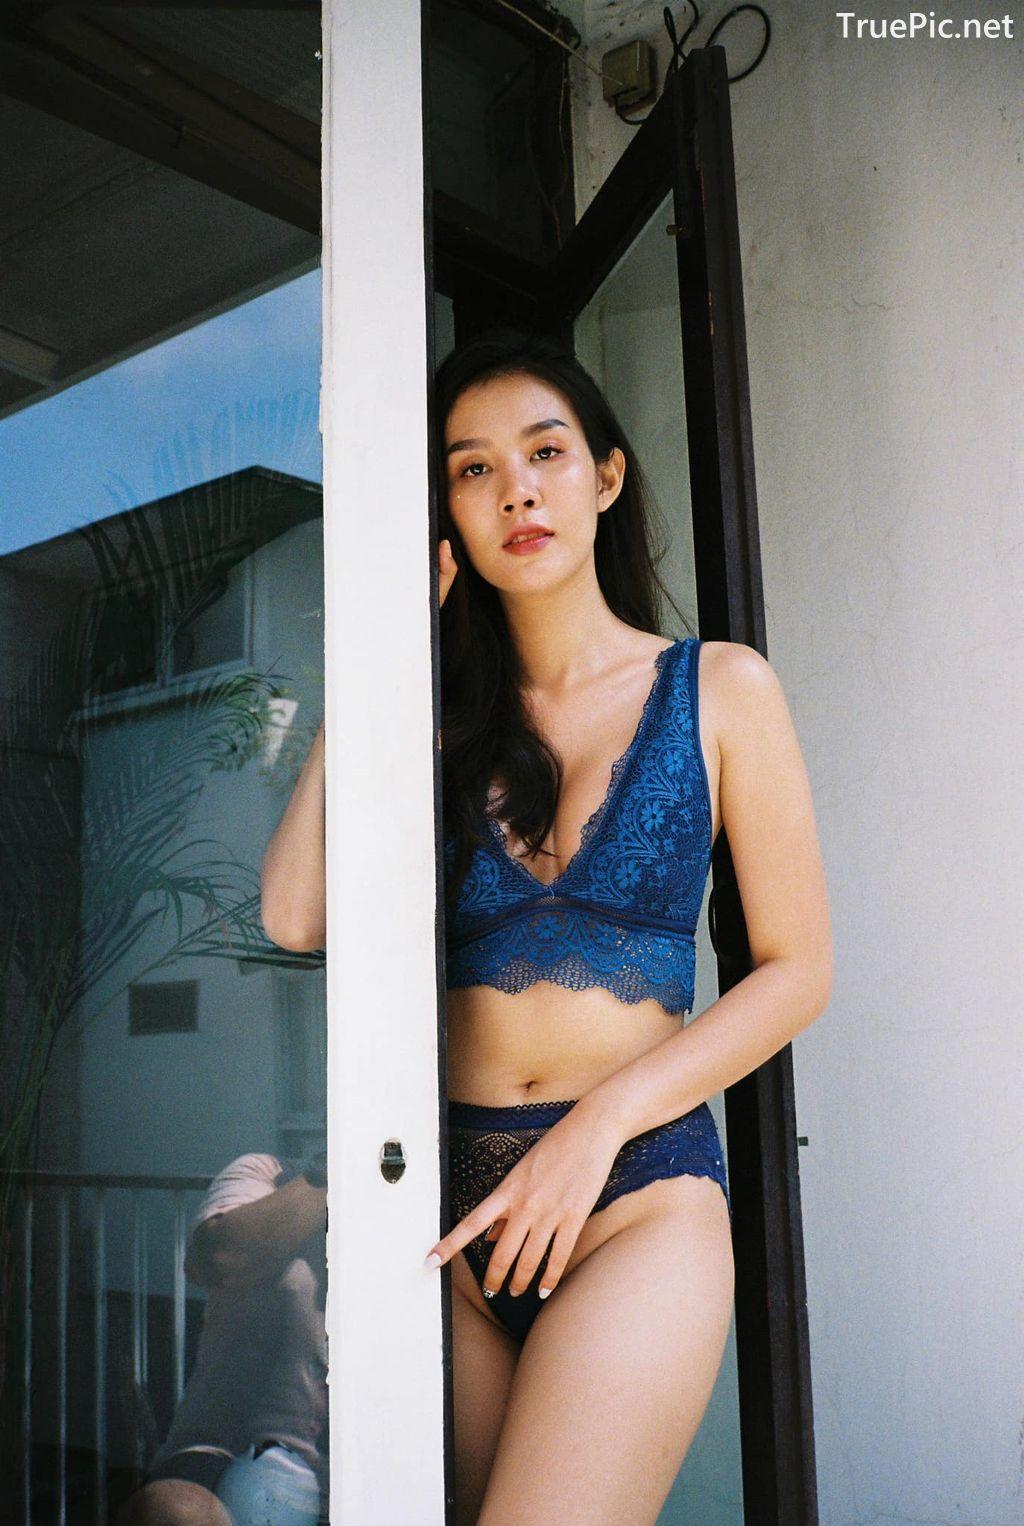 Image-Thailand-Model-Ssomch-Tanass-Blue-Lingerie-TruePic.net-TruePic.net- Picture-14